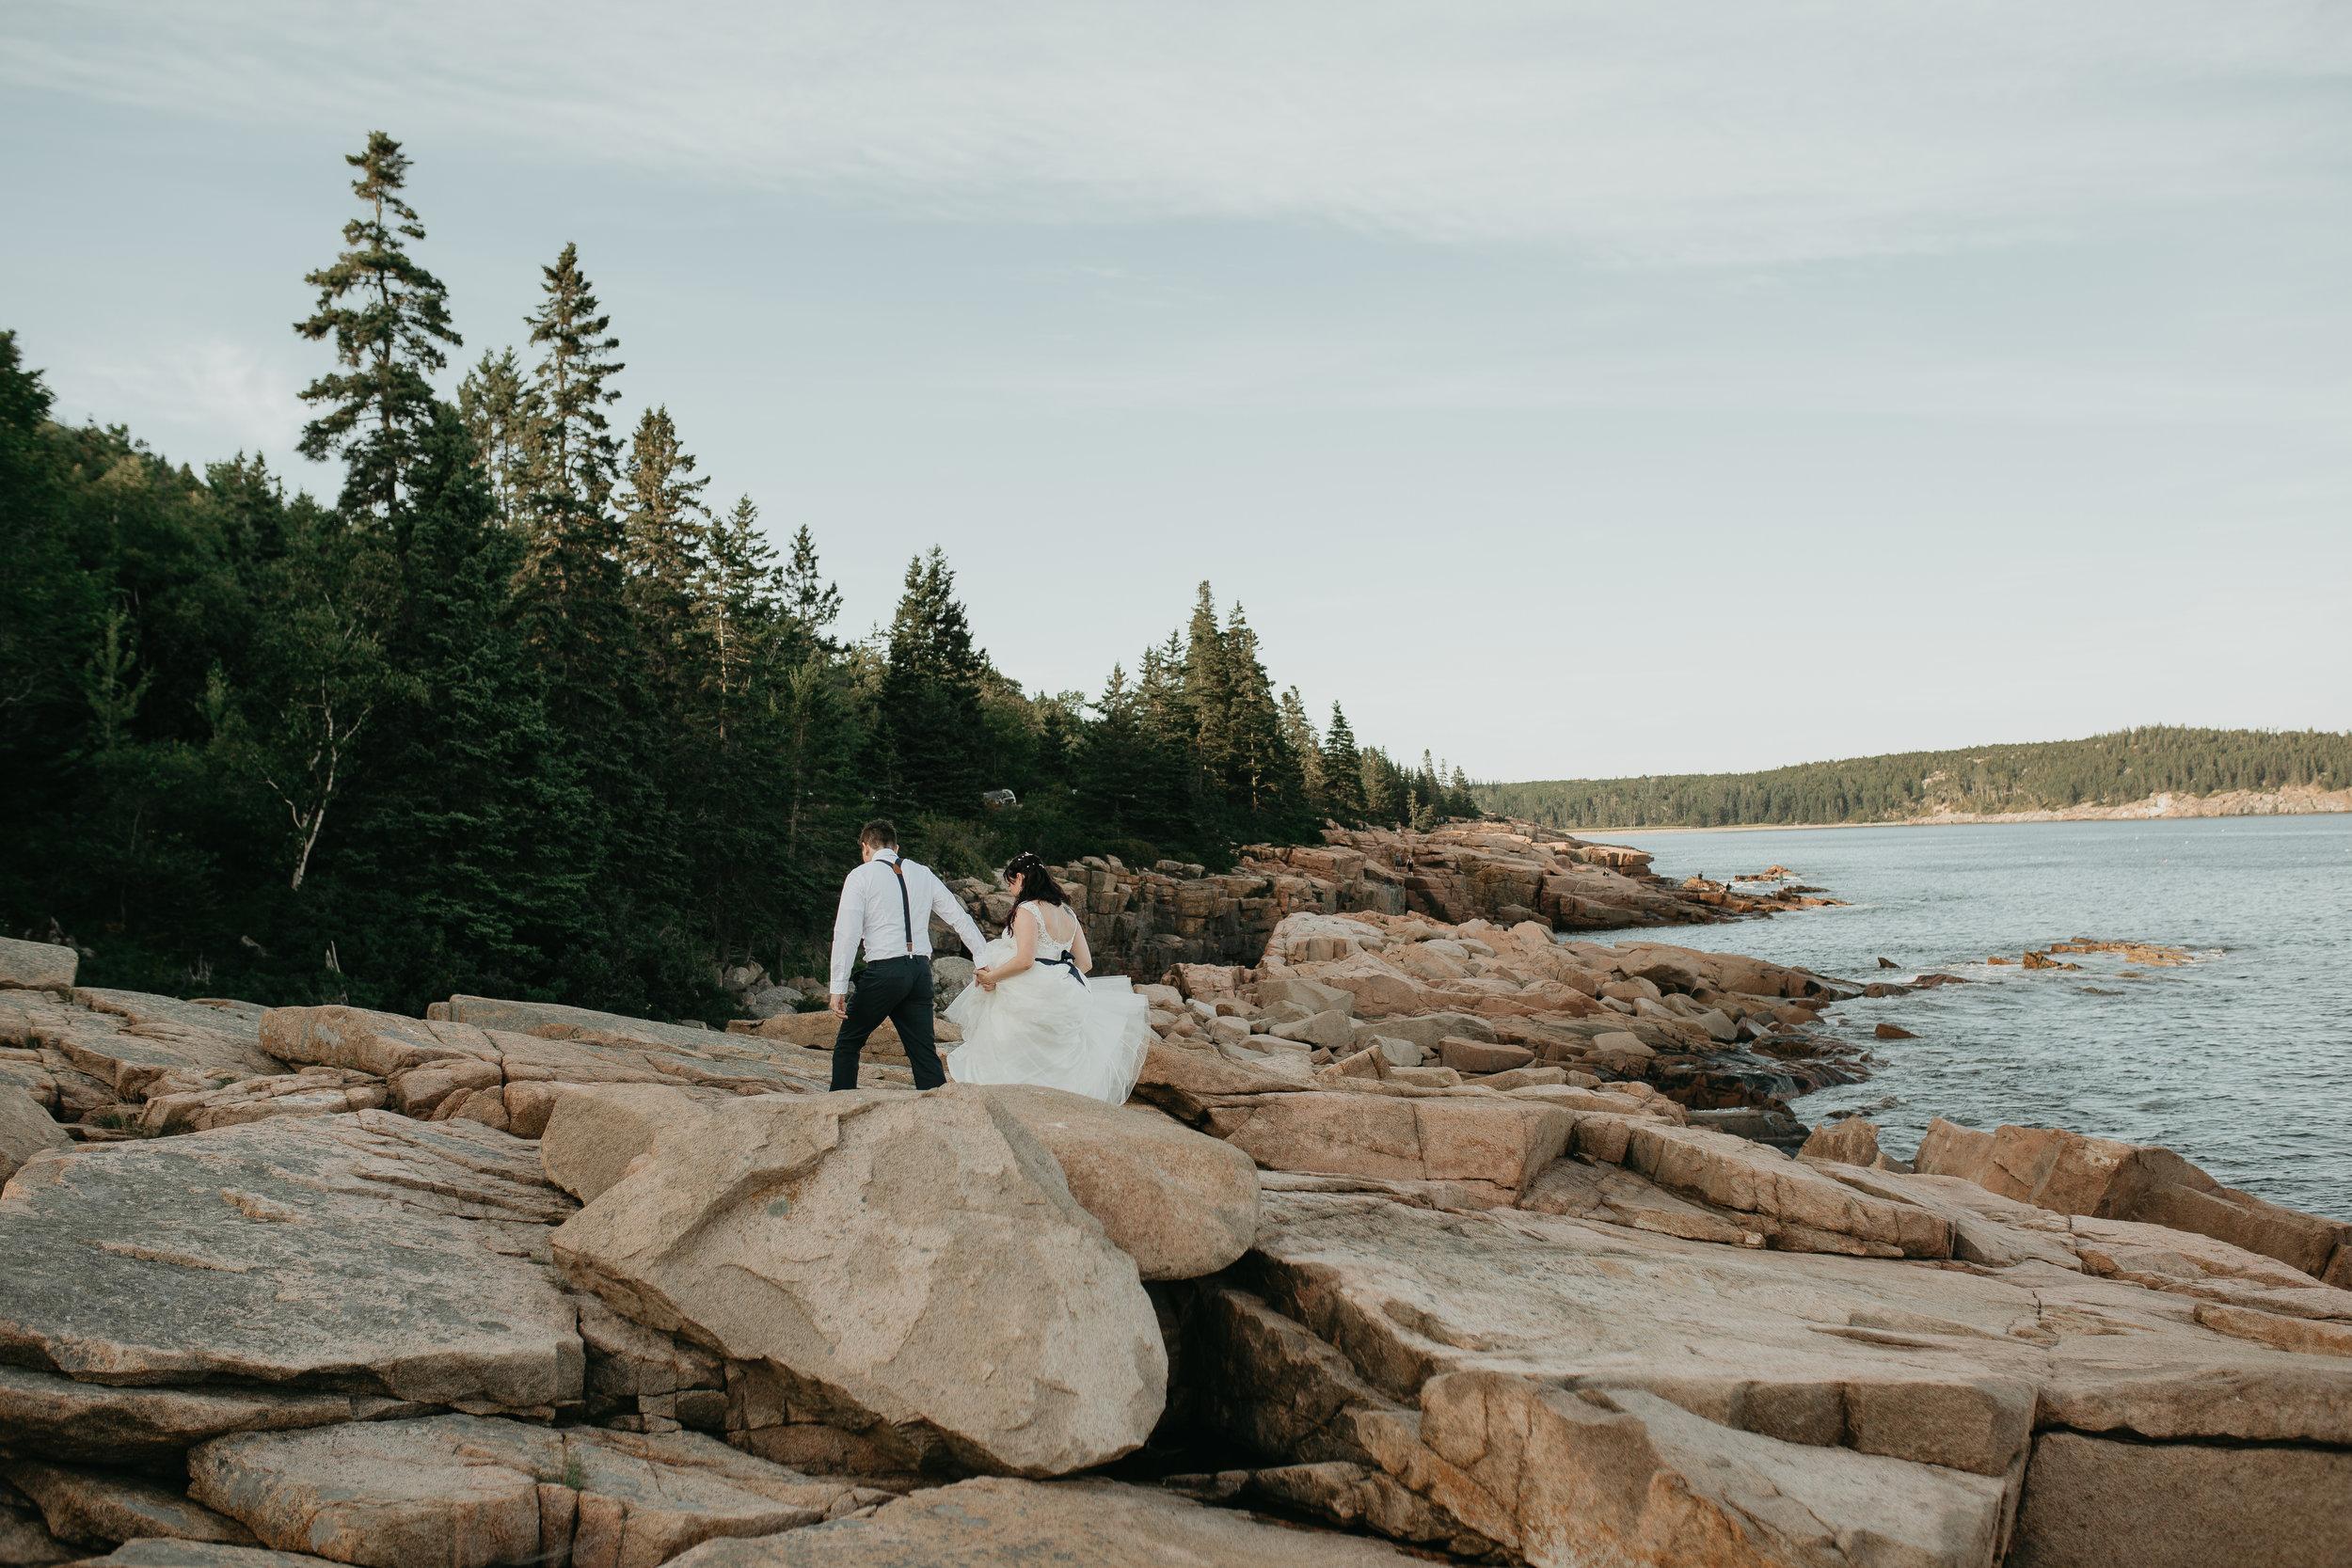 nicole-daacke-photography-Elopement-rocky-shoreline-coast-Acadia-National-Park-elopement-photographer-inspiration-maine-elopement-otter-cliffs-schoonic-head-point-46.jpg